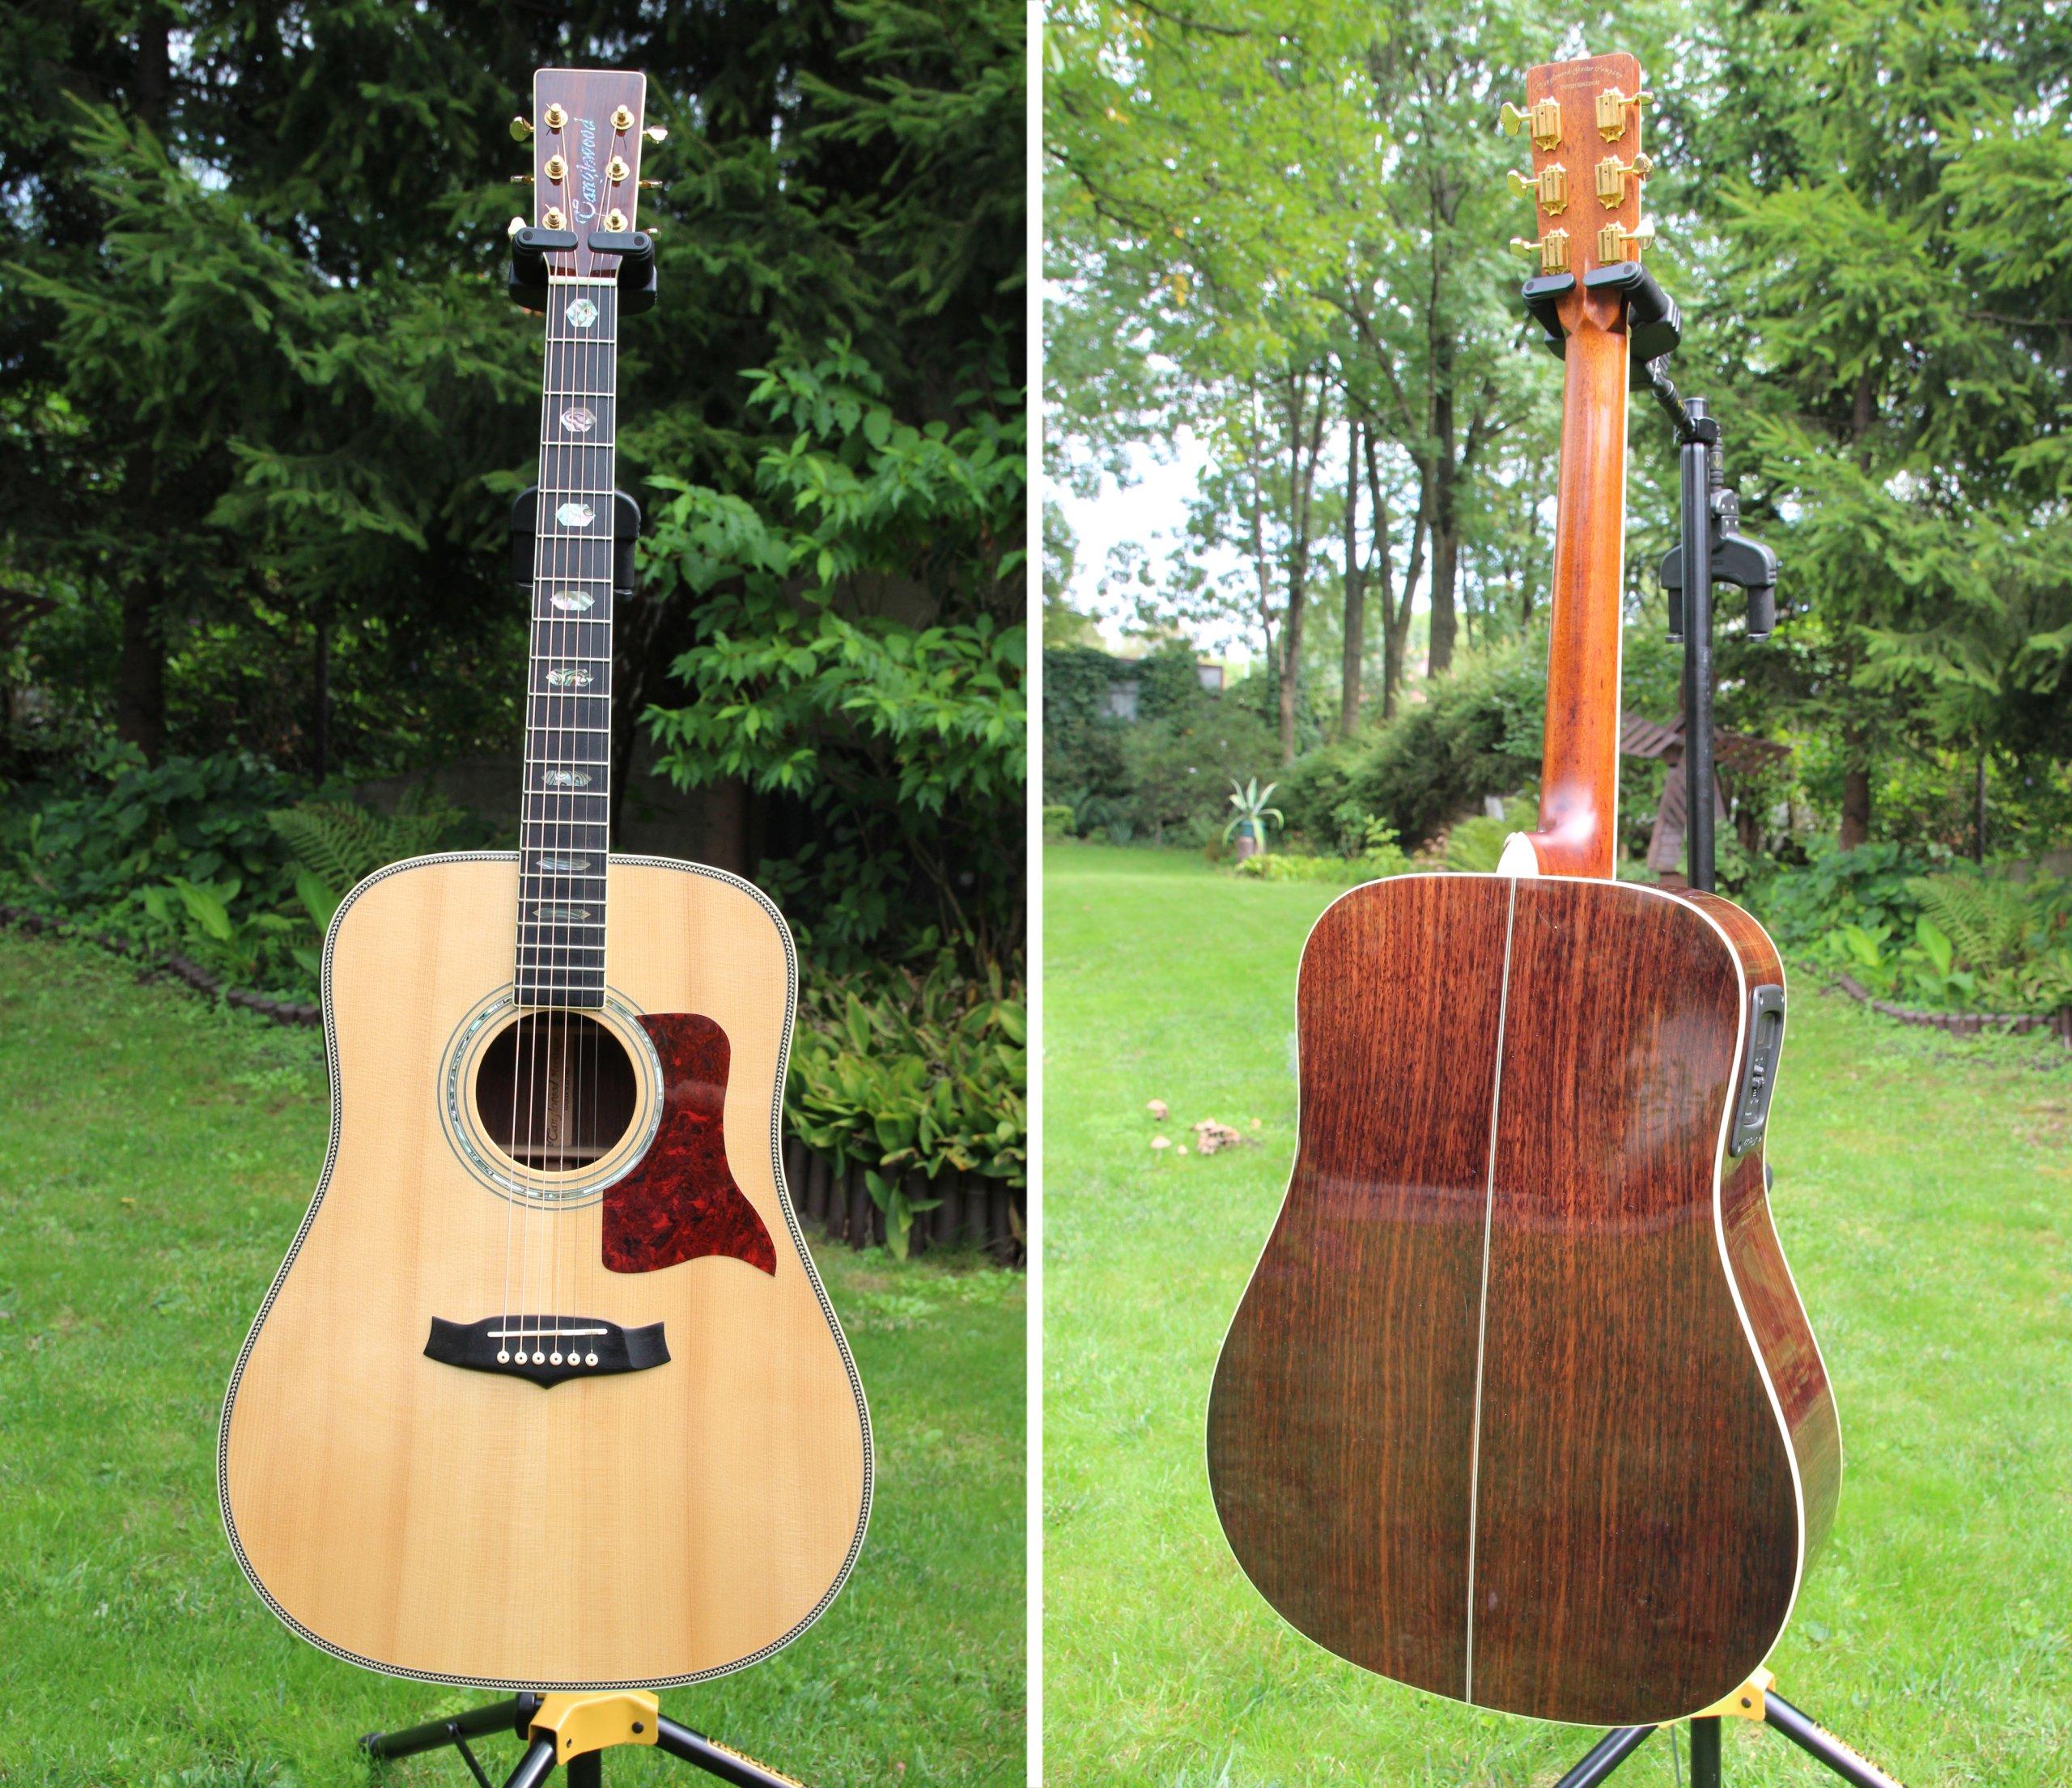 Gitara akustyczna Tanglewood TW1000 HSR,L.R. Baggs